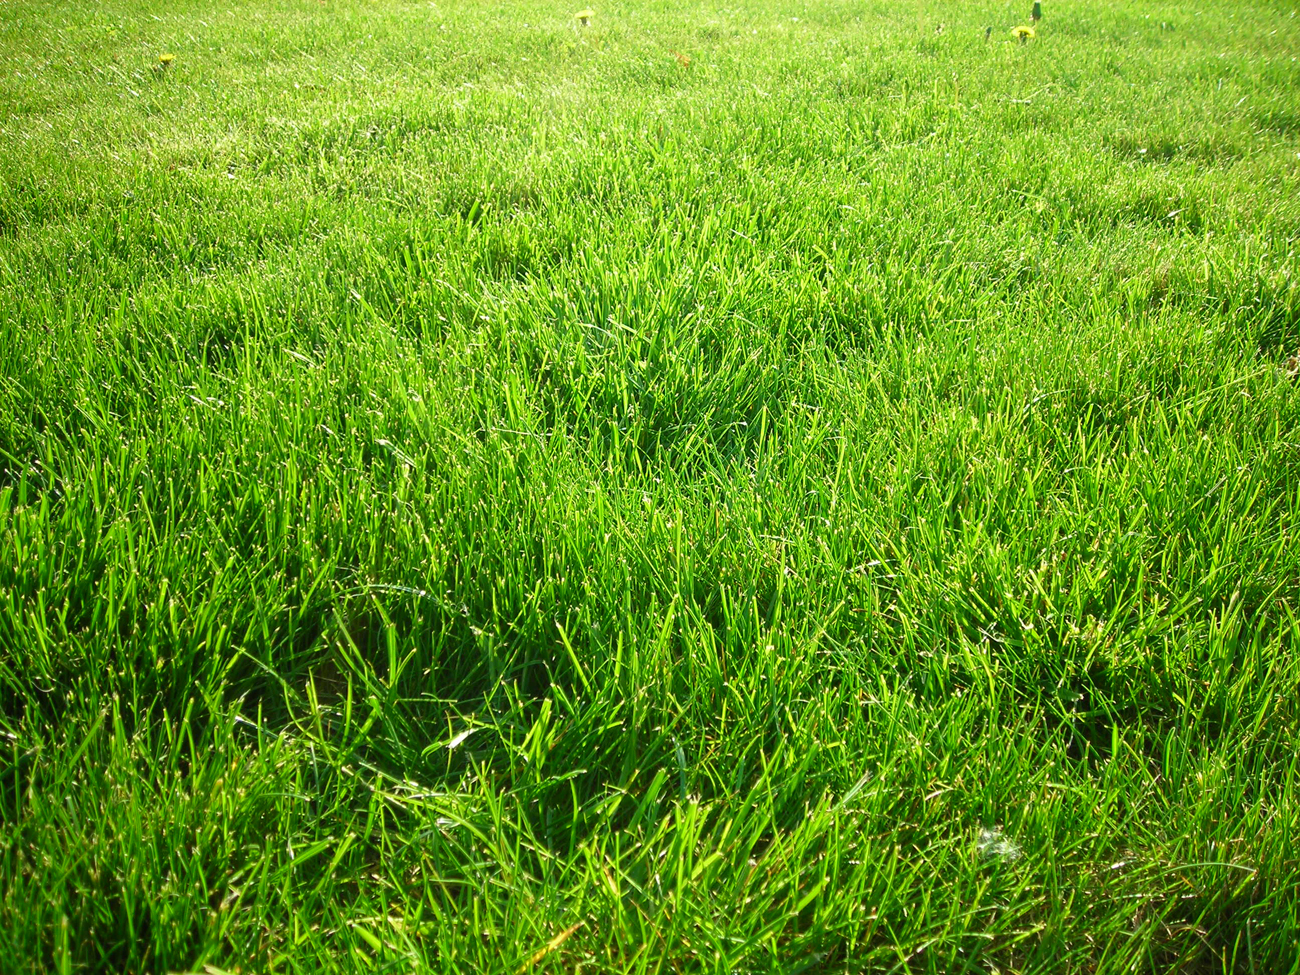 QQ Wallpapers: Grass Wallpapers